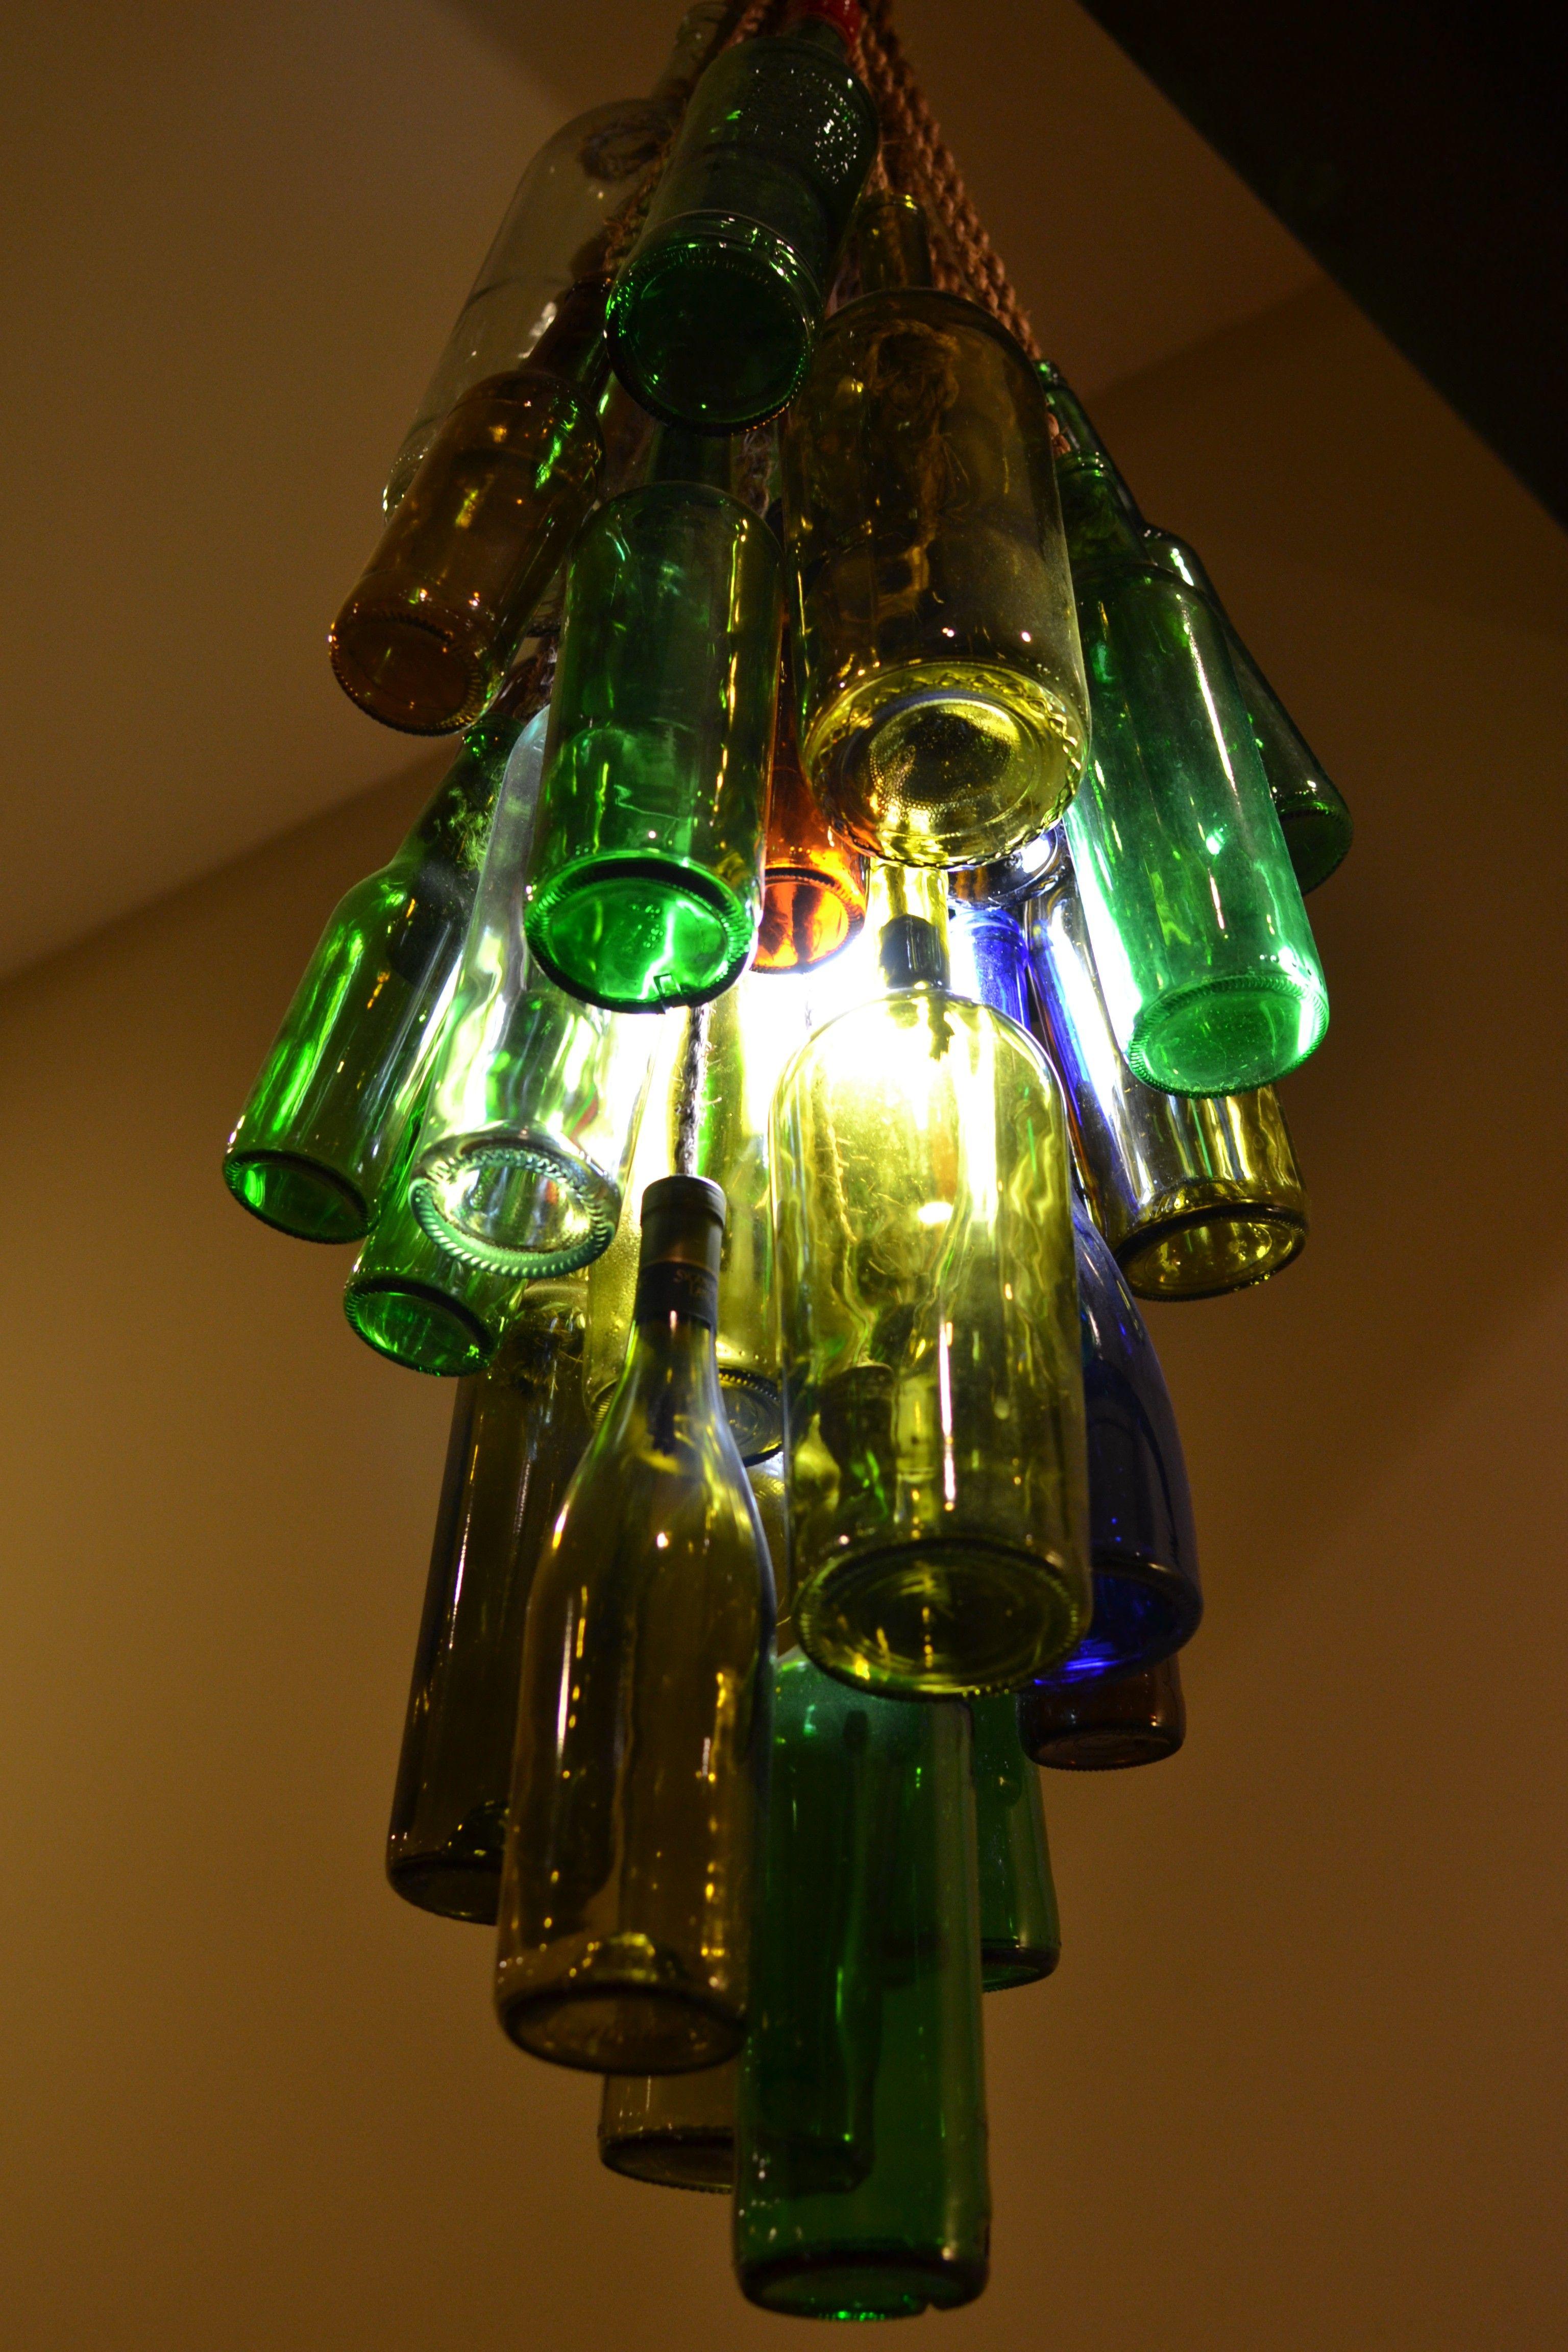 Diy art update bottle chandelier bottle chandelier diy bottle bottle art diy art update bottle chandelier little paths so startled arubaitofo Image collections